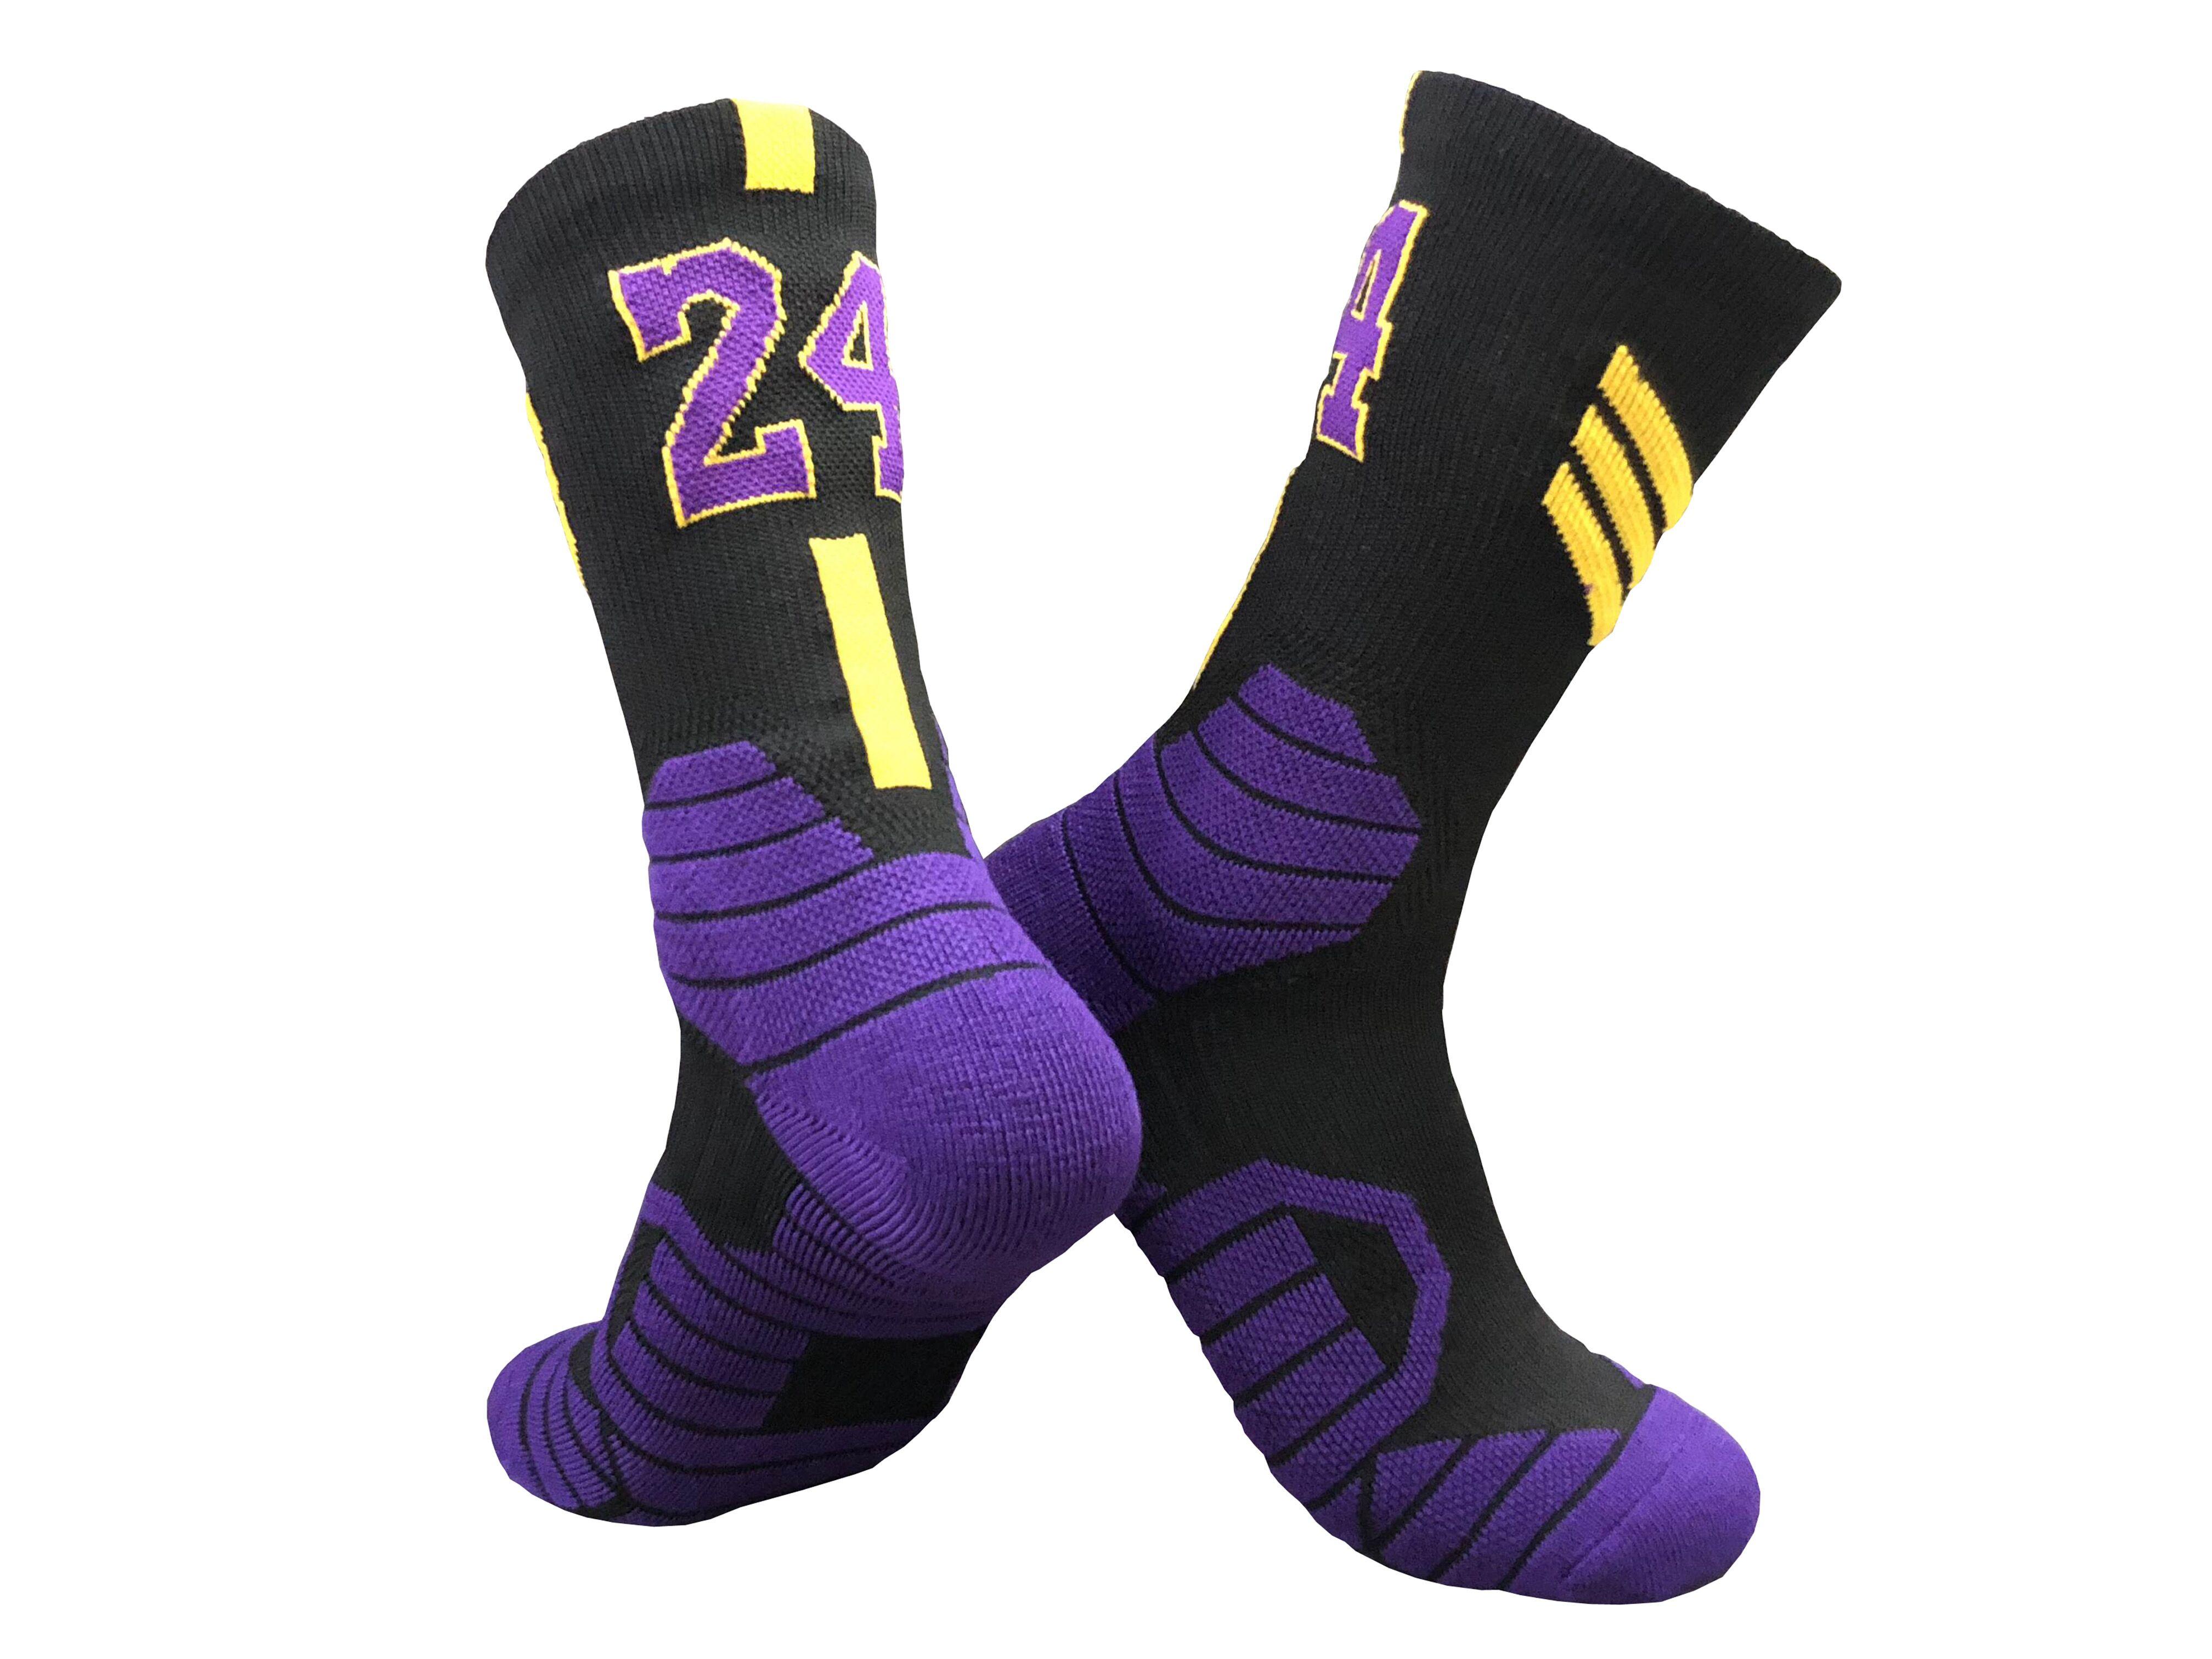 1 pair 24 black